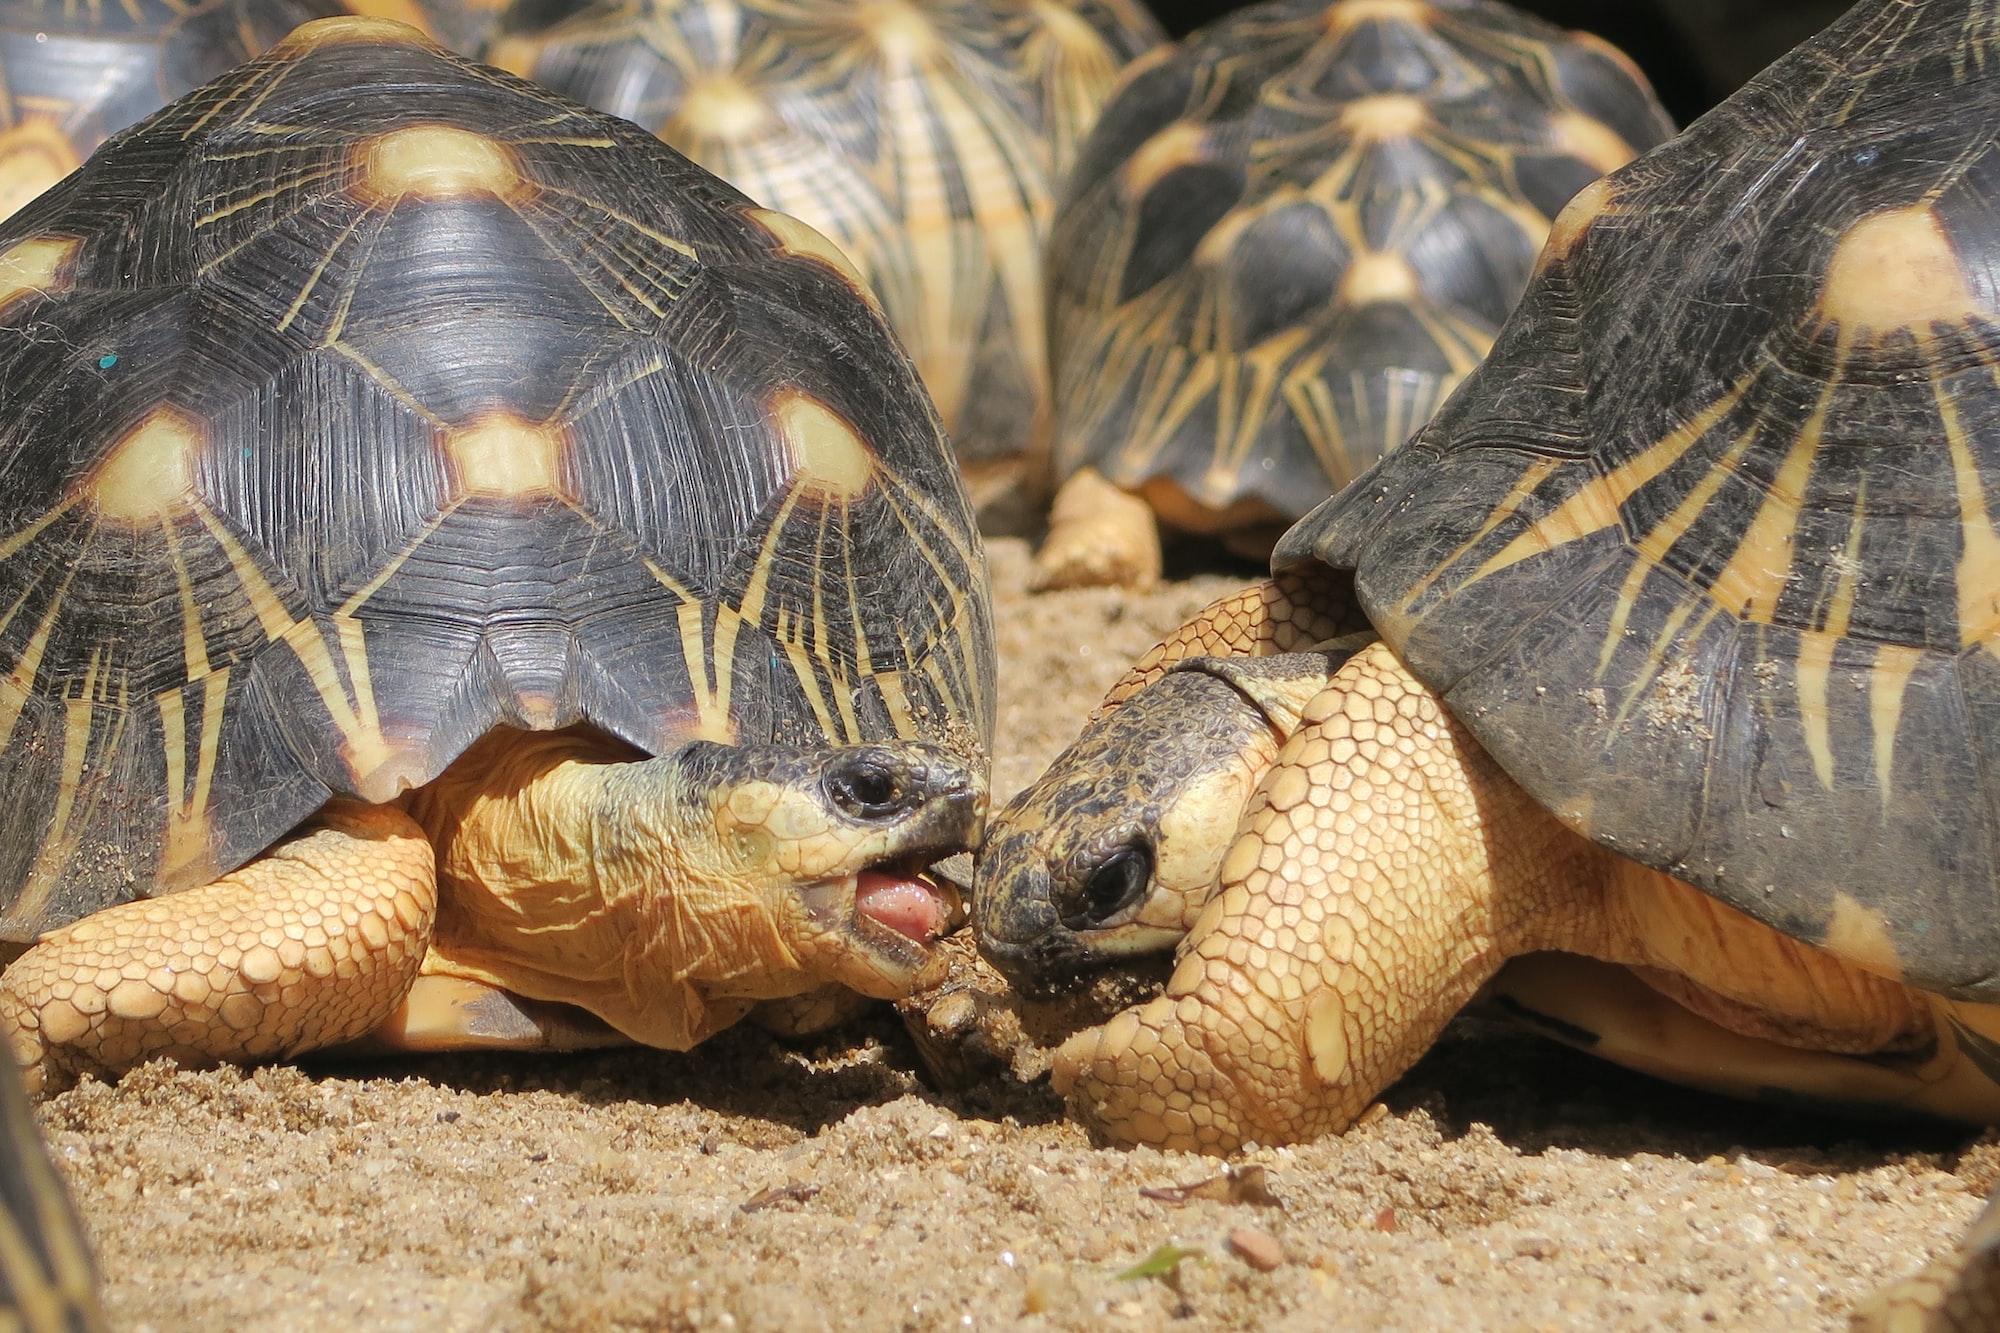 Trump, Zuckerberg & Dorsey: Turtles All the Way Down